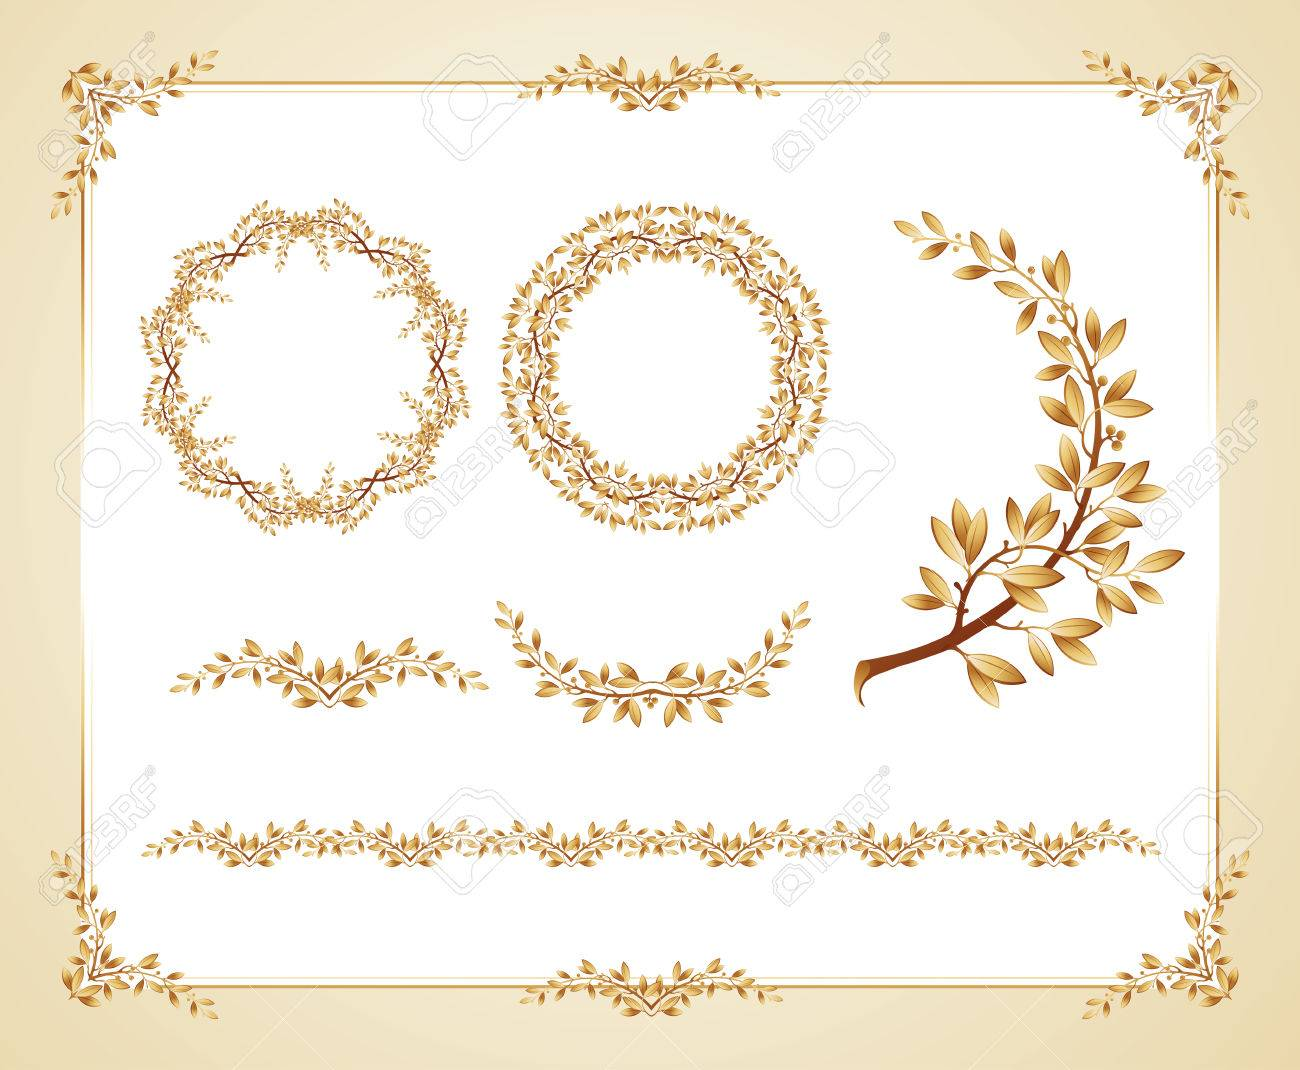 Vector Illustration Certificate Template With Laurel Design Elements